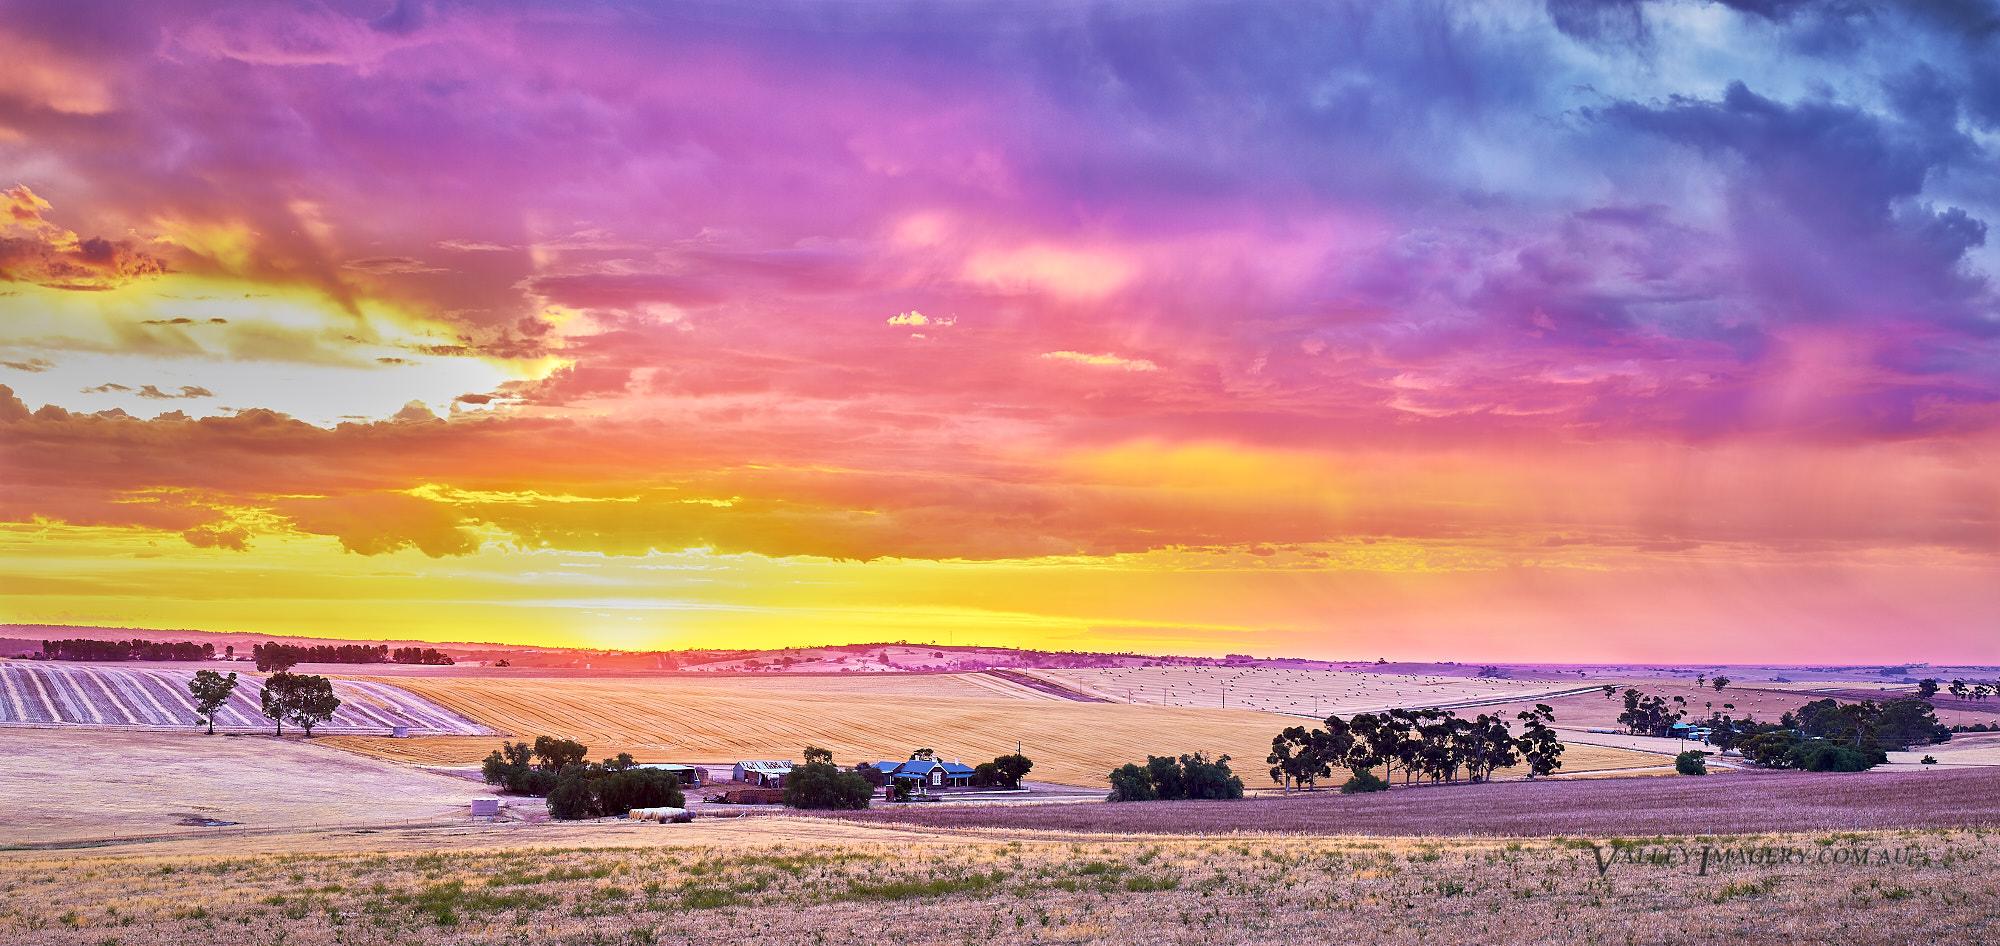 Sunset Farmland in the Barossa Valley